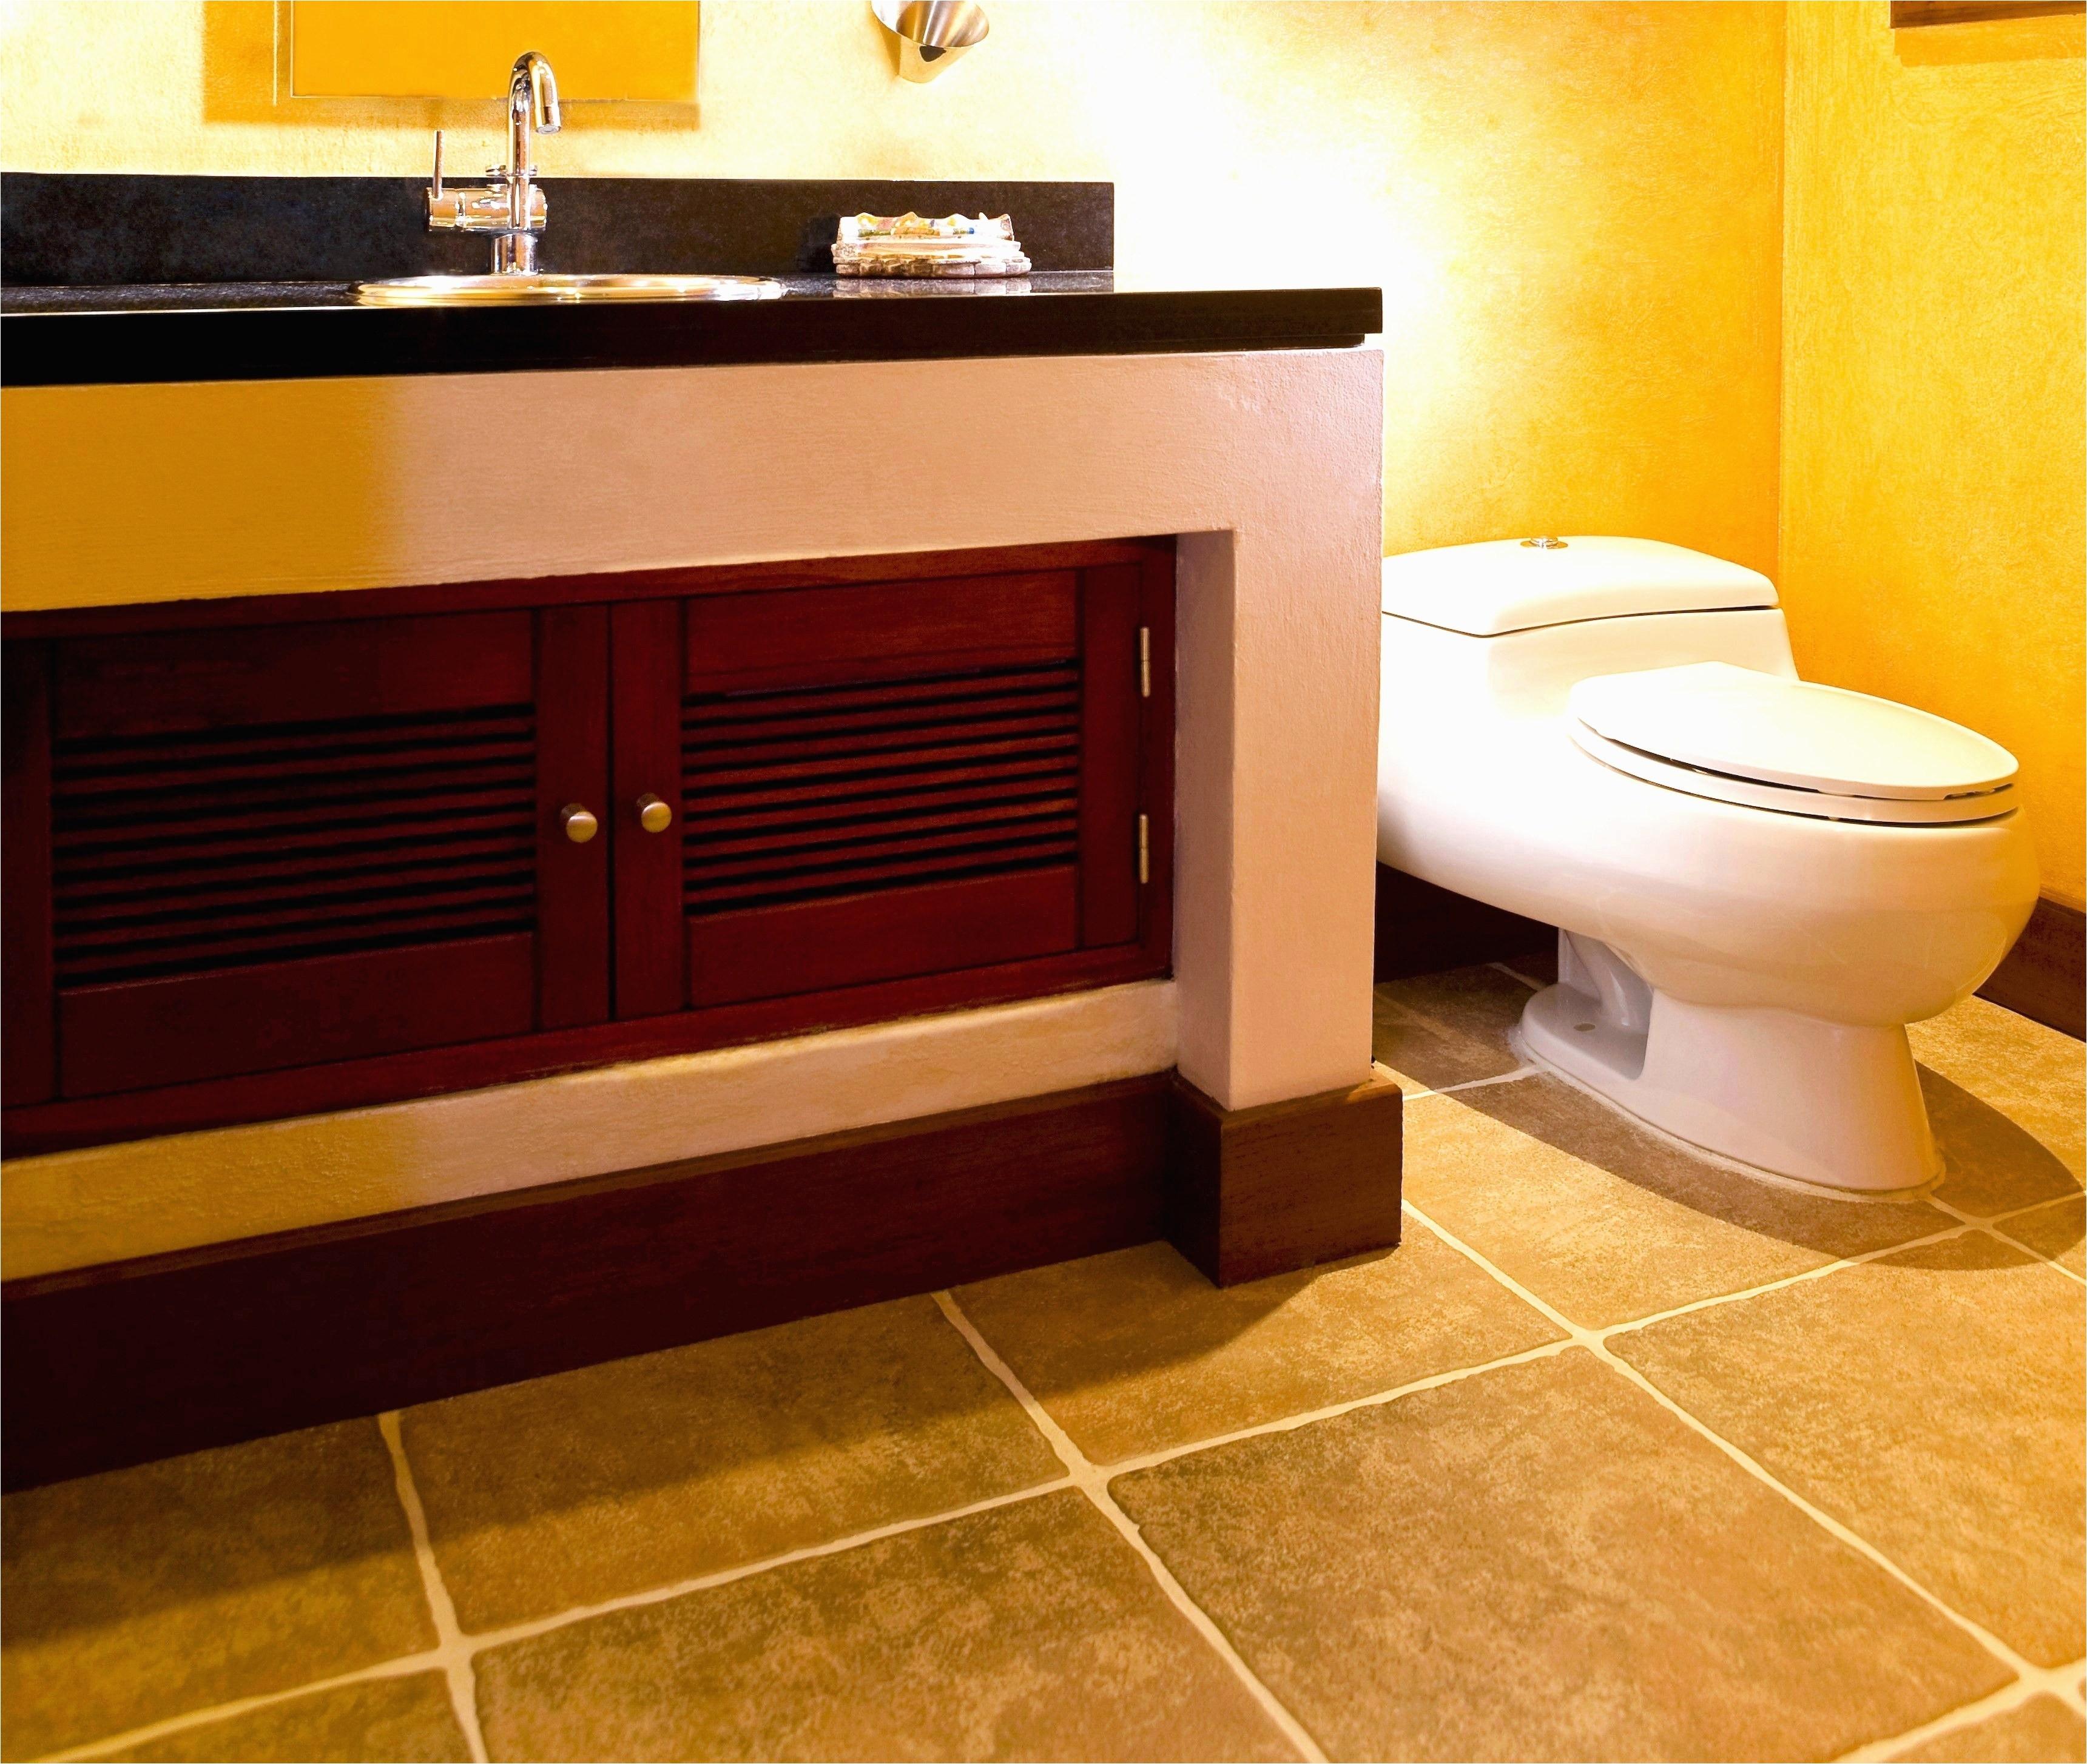 Very Best Home Decor Tile Best Floor Tiles Mosaic Bathroom 0d New Bathroom